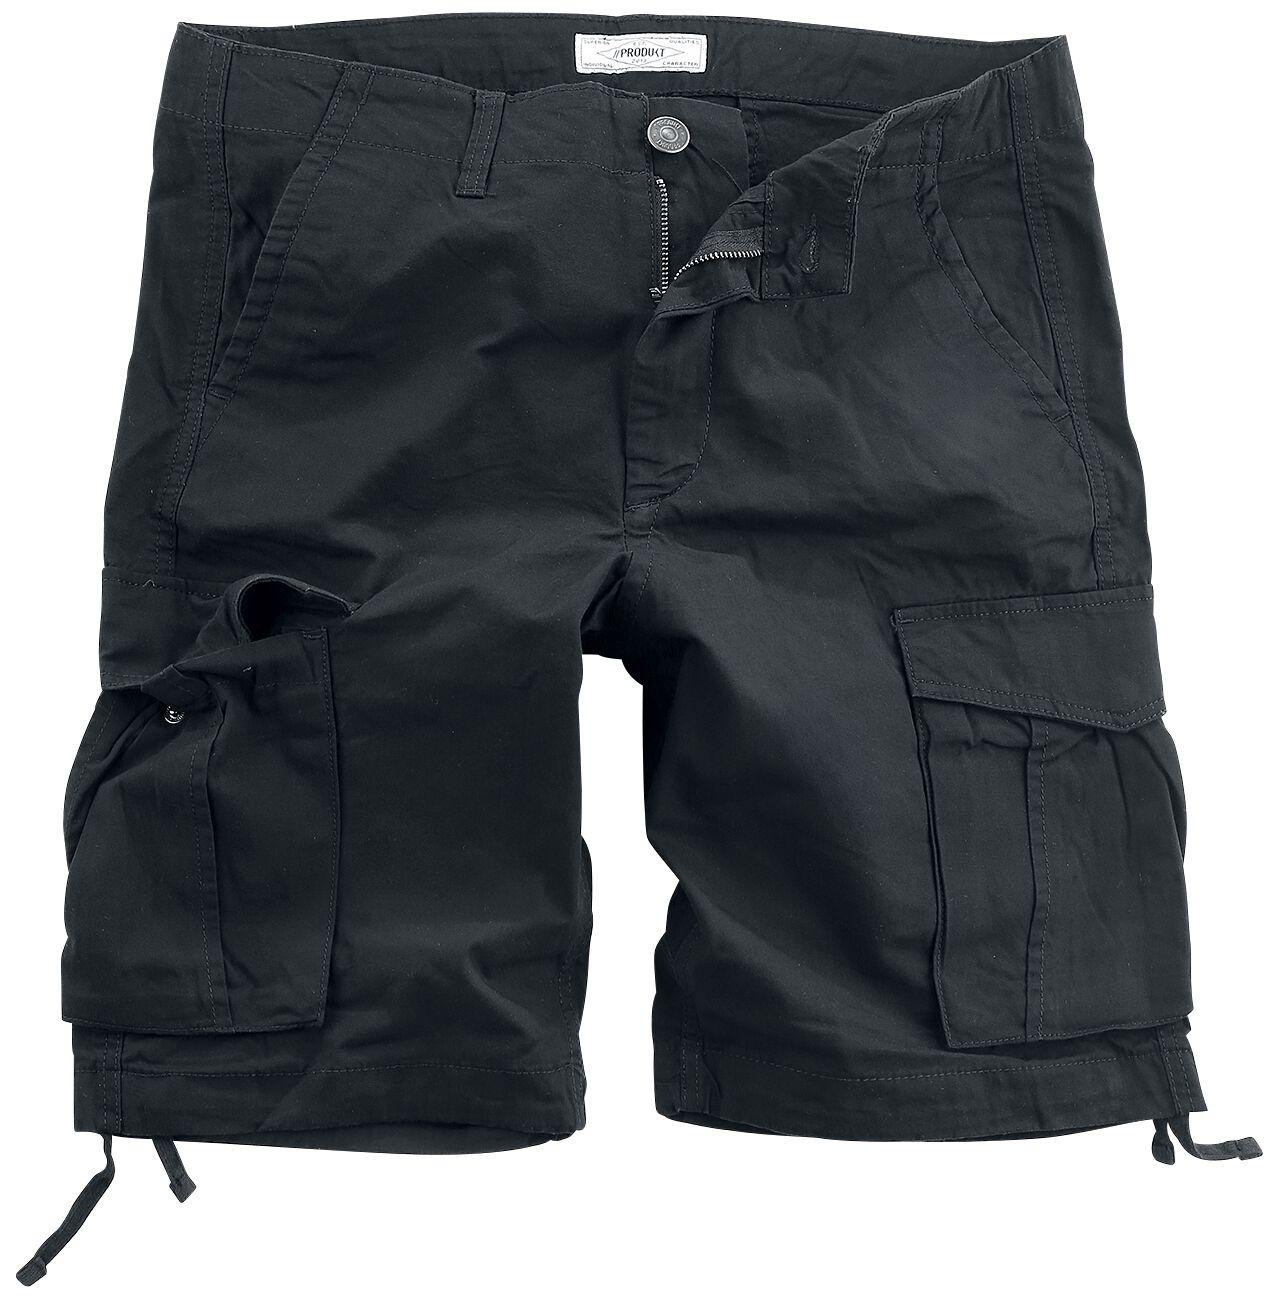 Image of Produkt Castor Cargo Shorts Cargo-Shorts schwarz